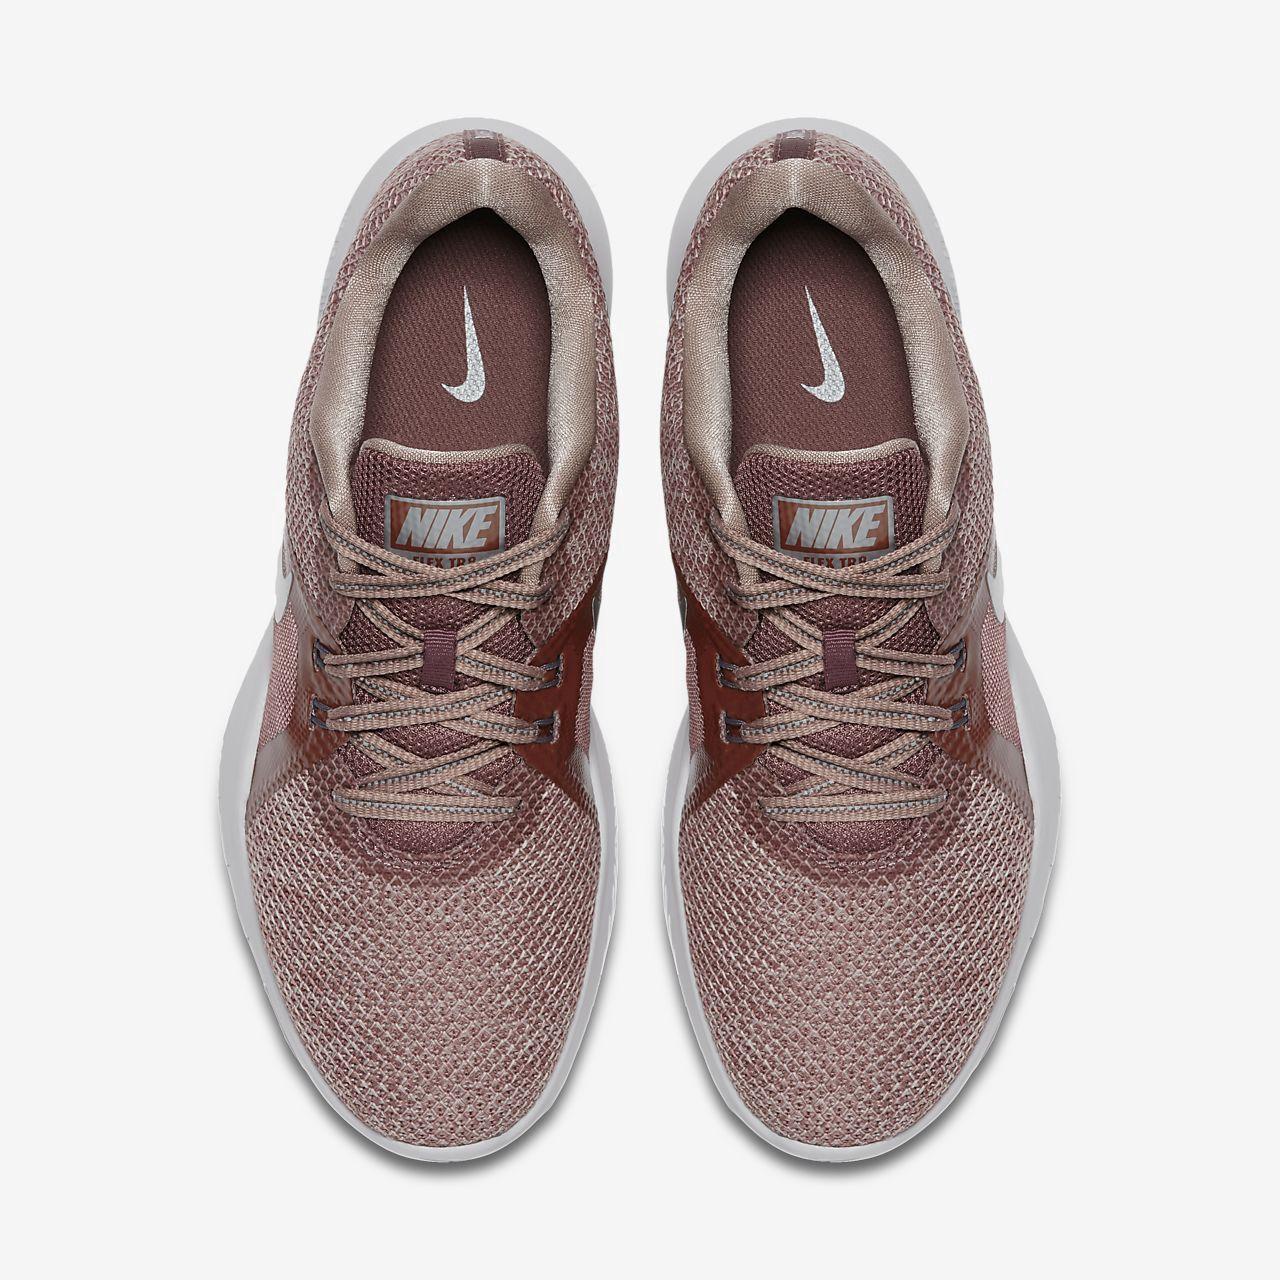 f5c2ebcb4ab9a Nike Flex Trainer 8 Premium Women s Training Shoe - 11.5